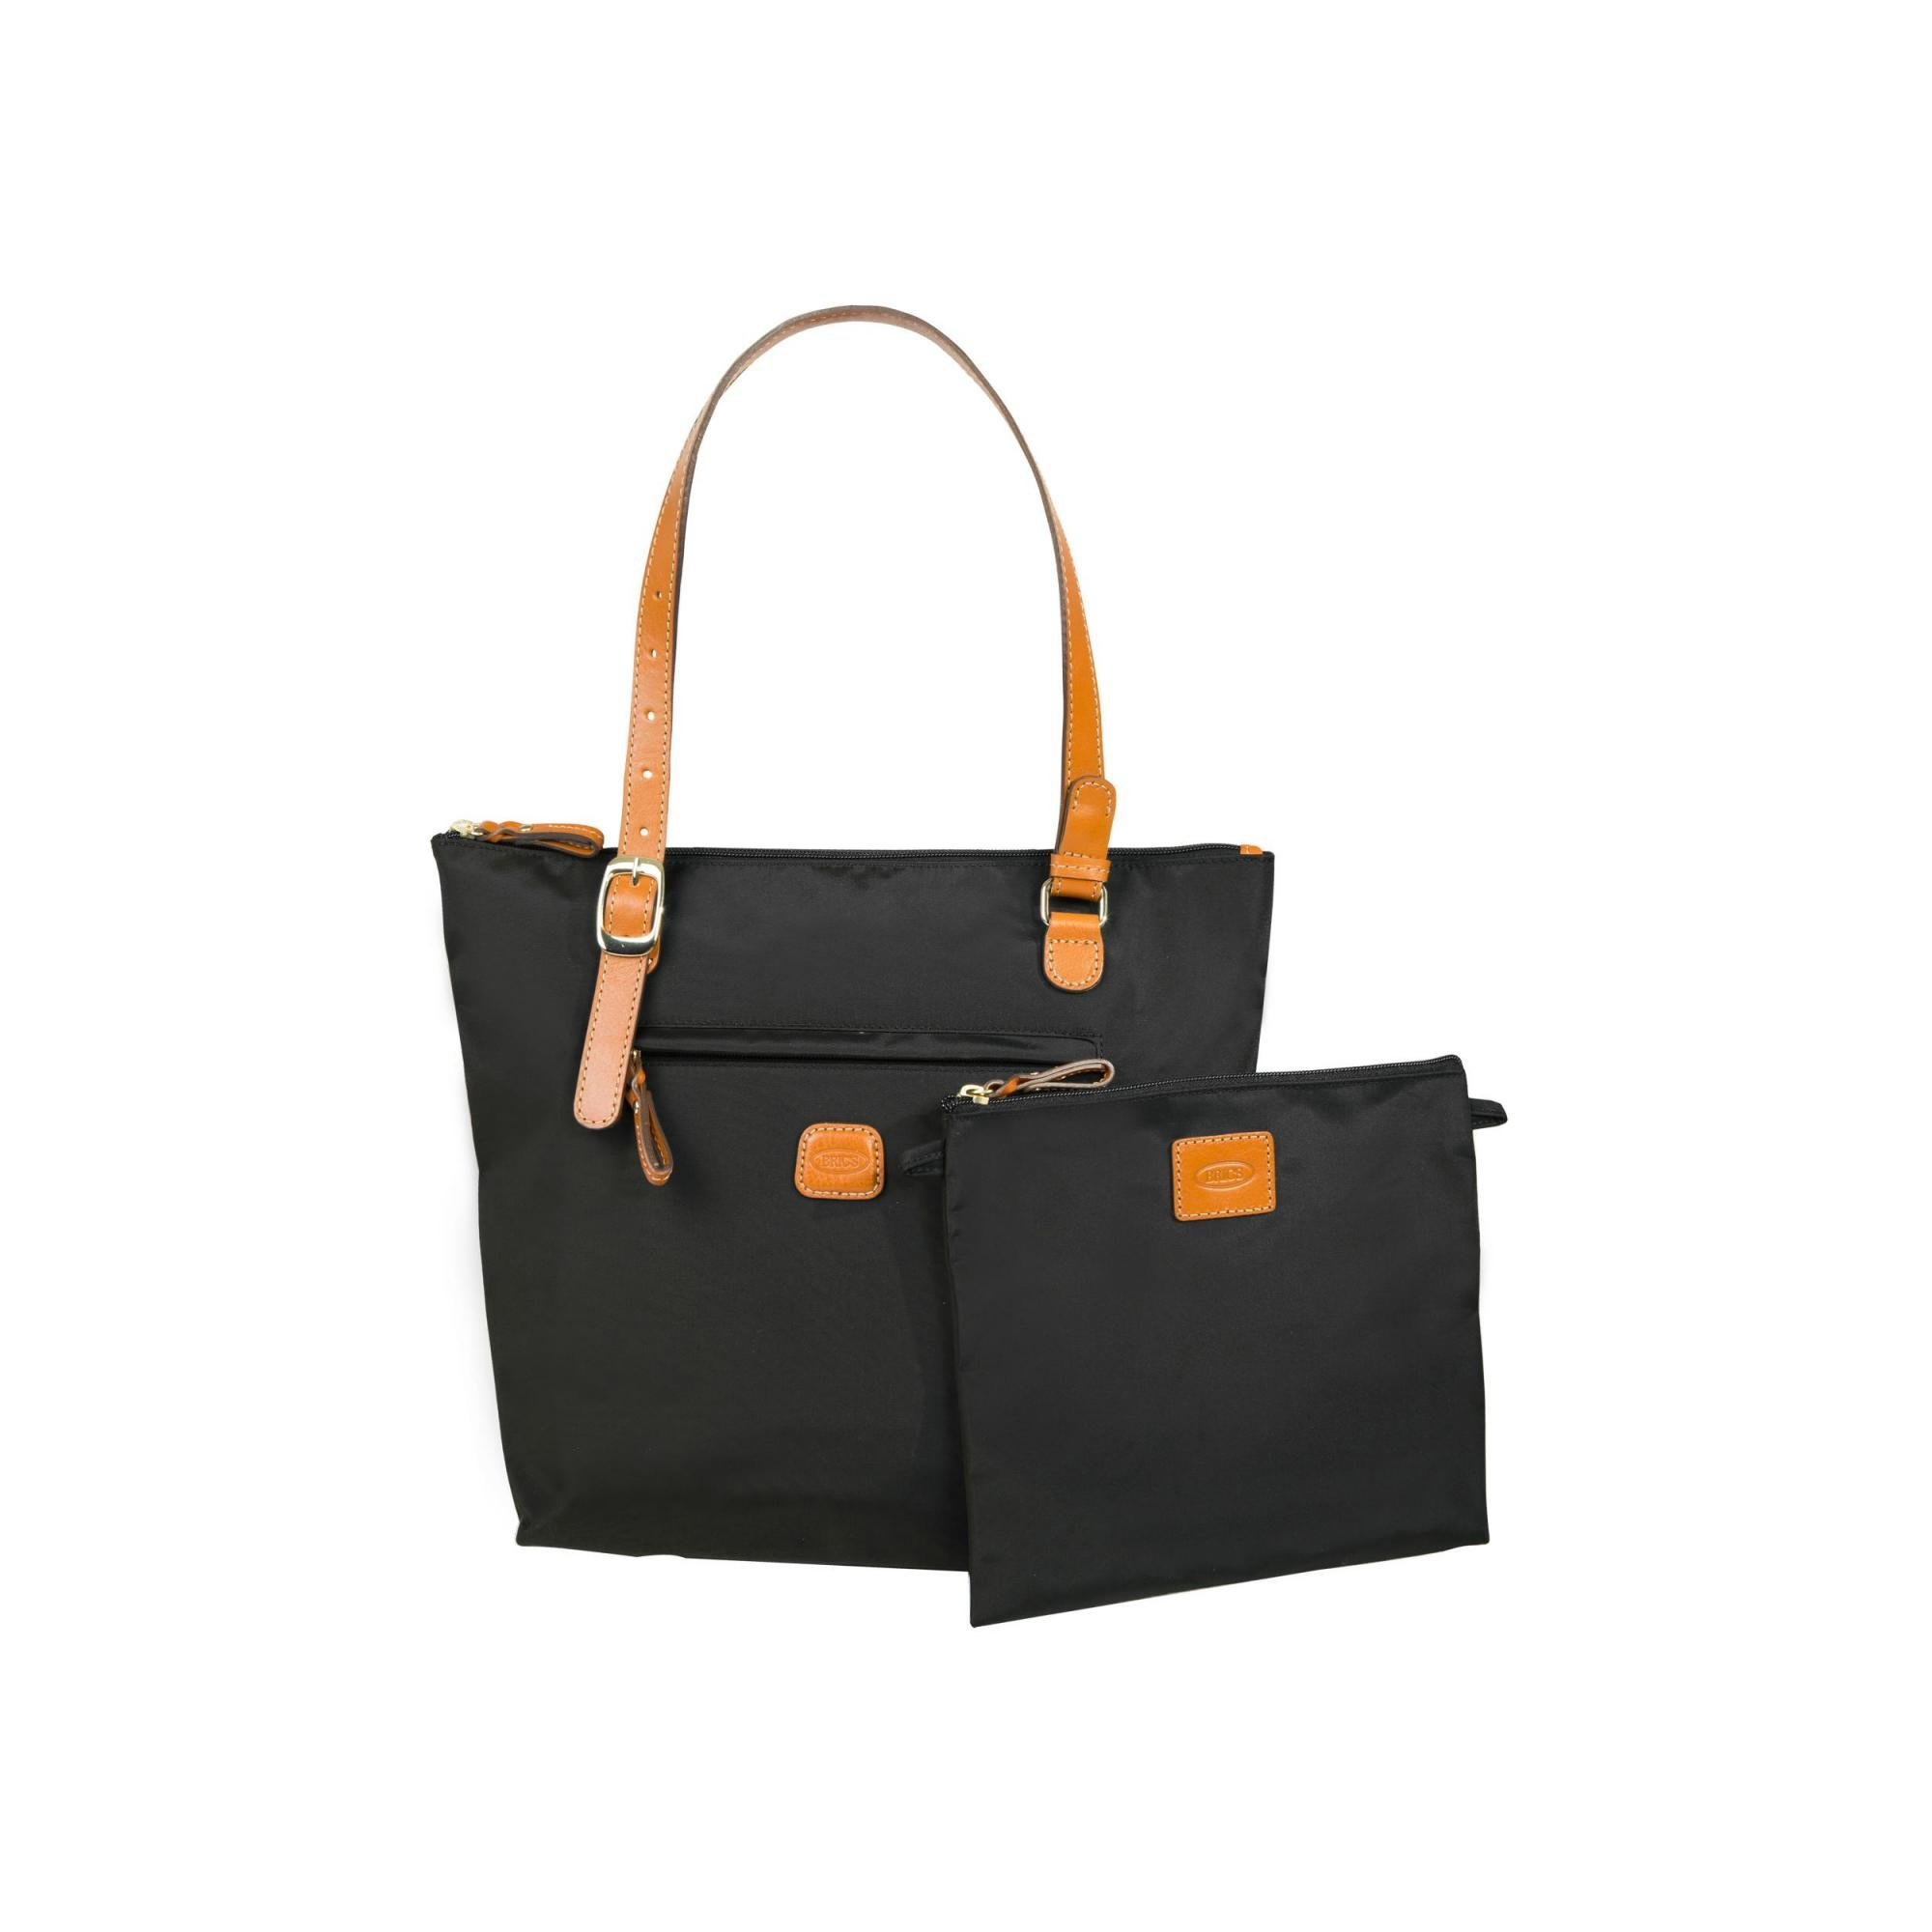 Bric's Women's X x 2.0 Large Sportina Shopper Tote Travel Shoulder Bag, Black, One Size